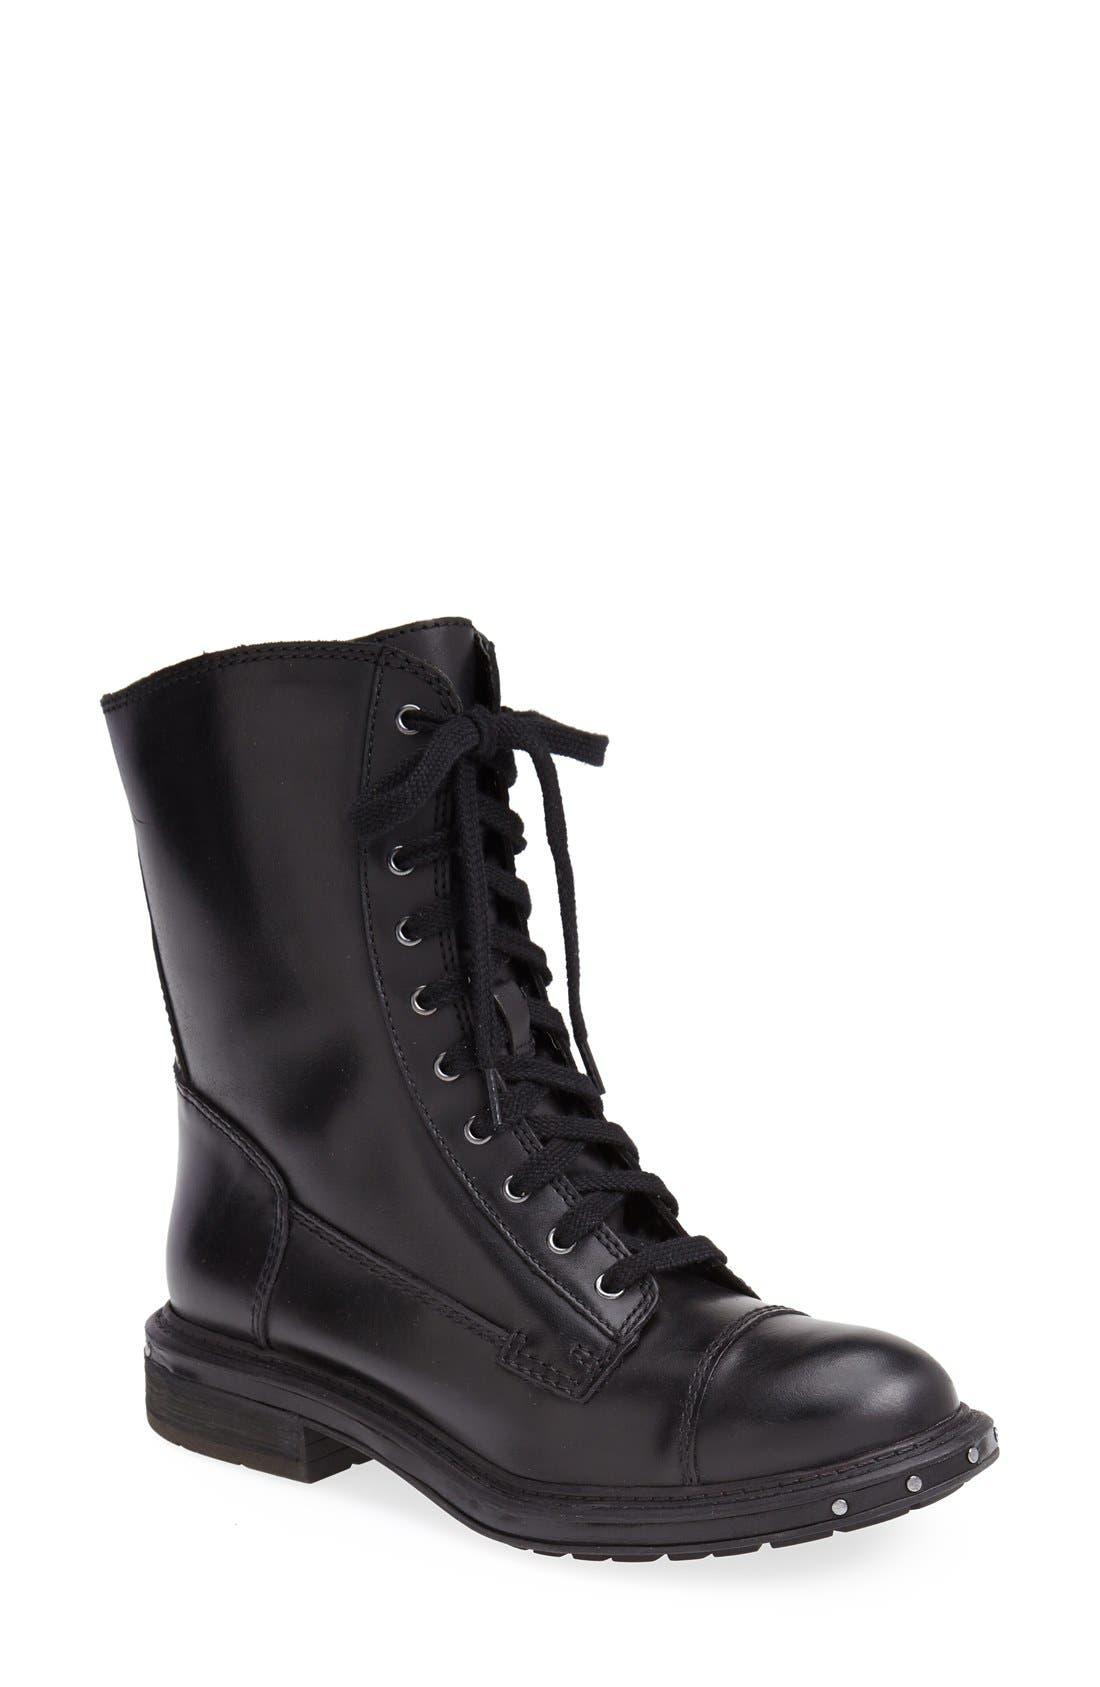 NAYA 'Renata' Hand Finished Leather Boot, Main, color, 001